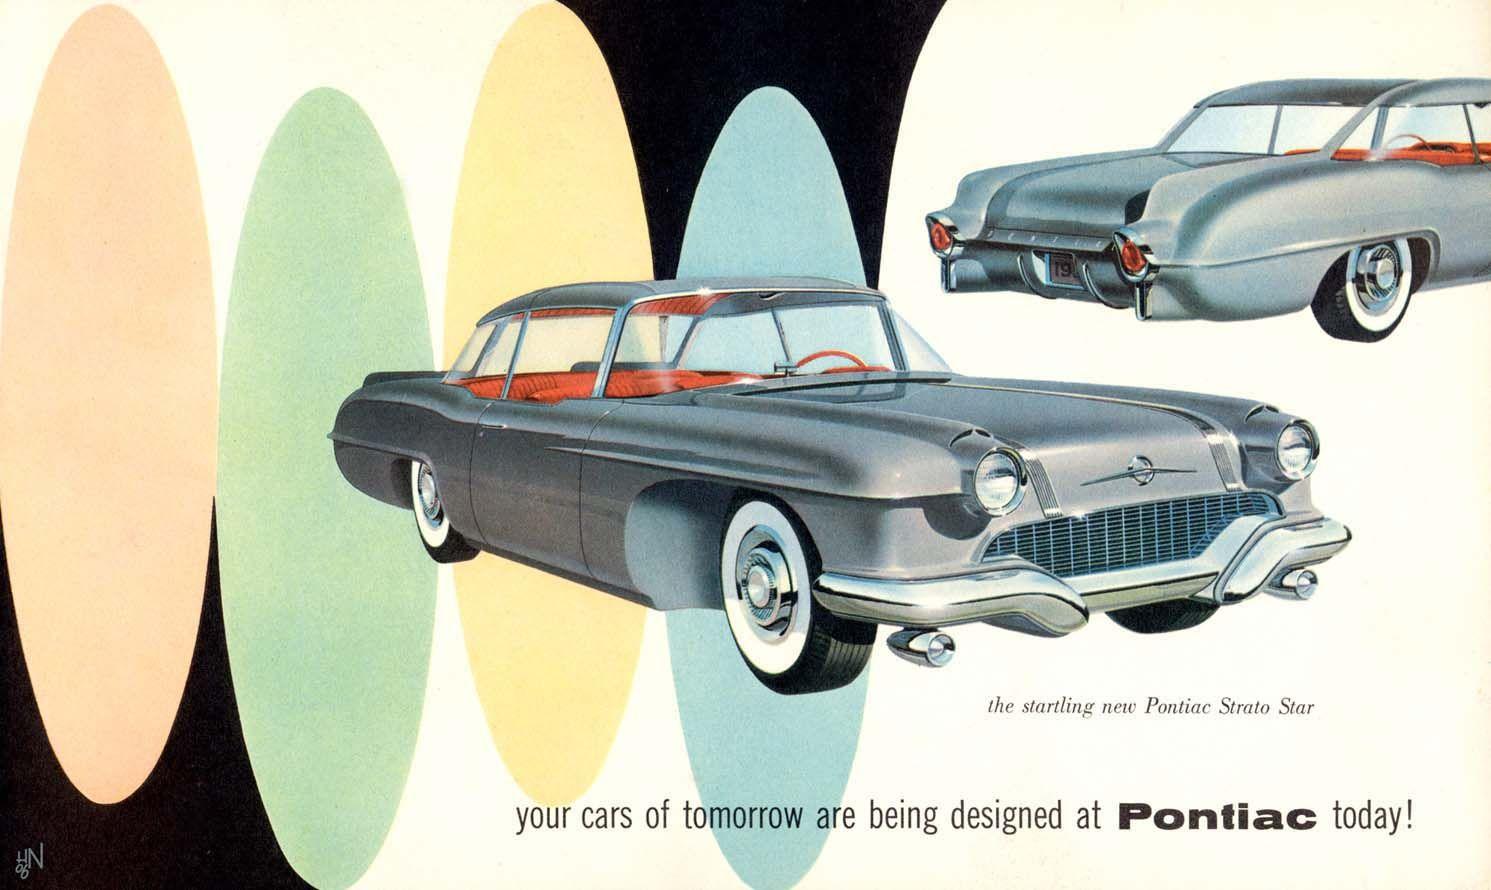 1955 Pontiac Stato Star